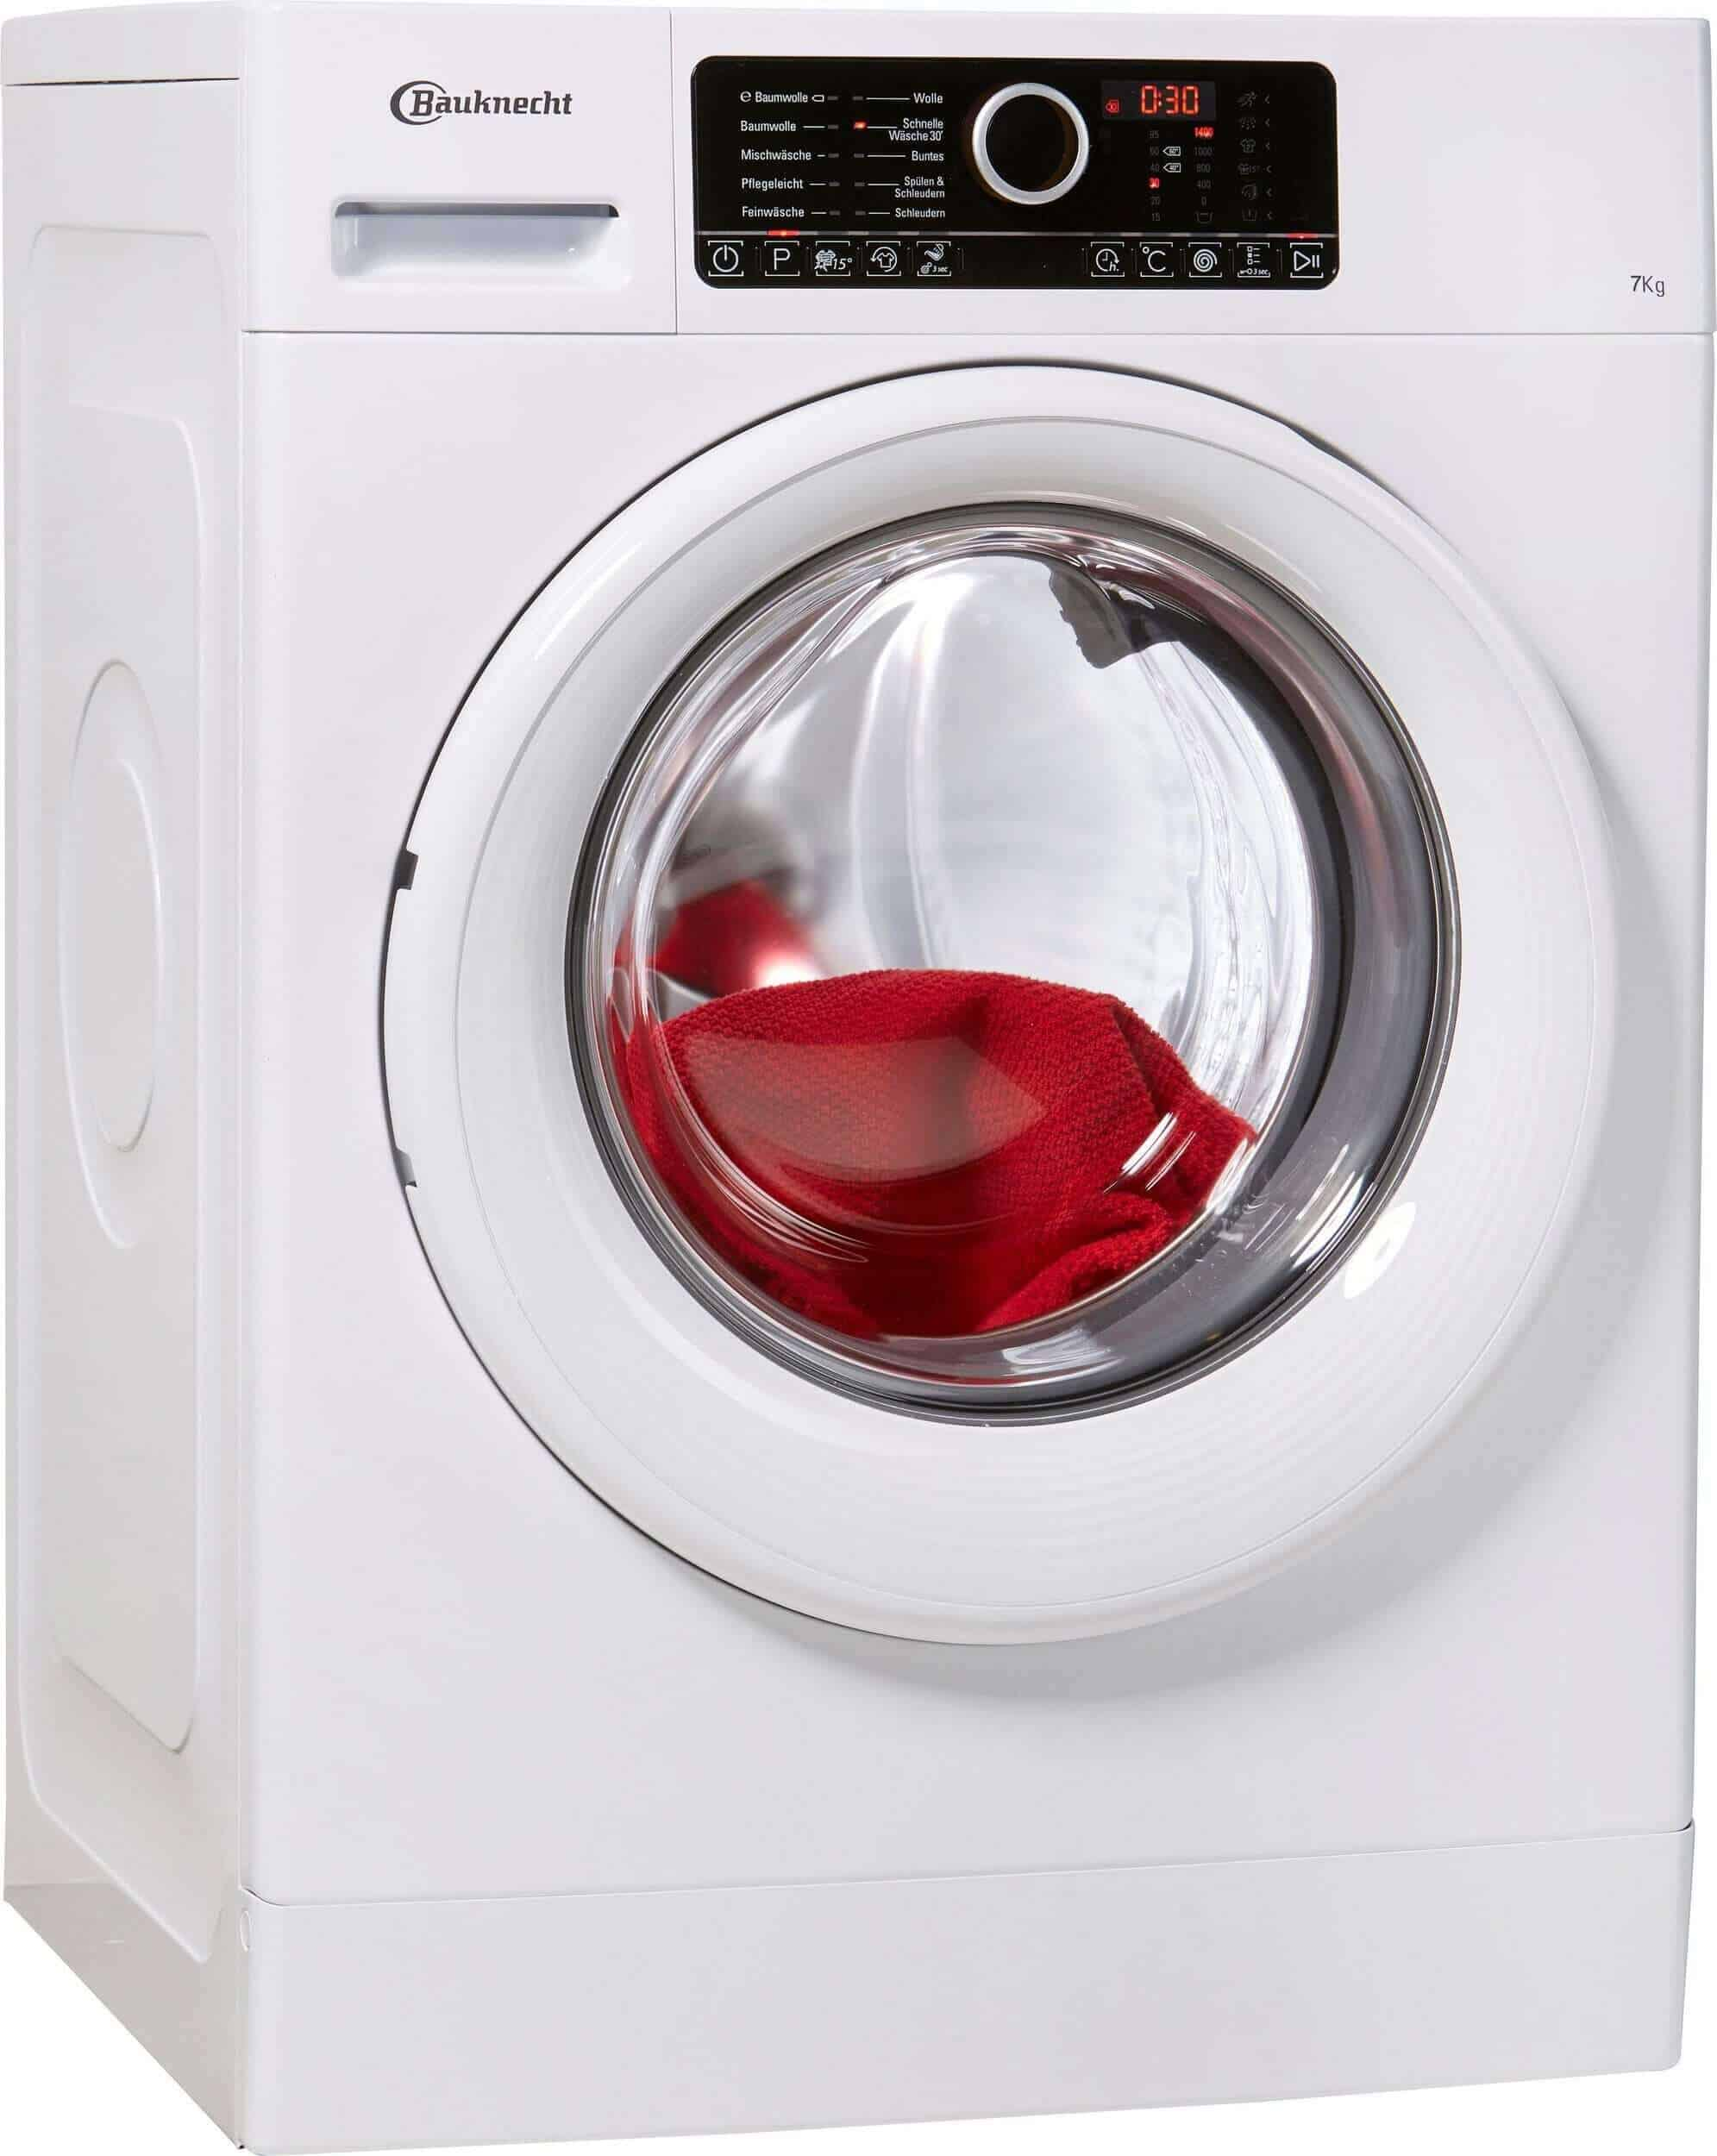 Bauknecht Super Eco 7416 Moderne Waschmaschine